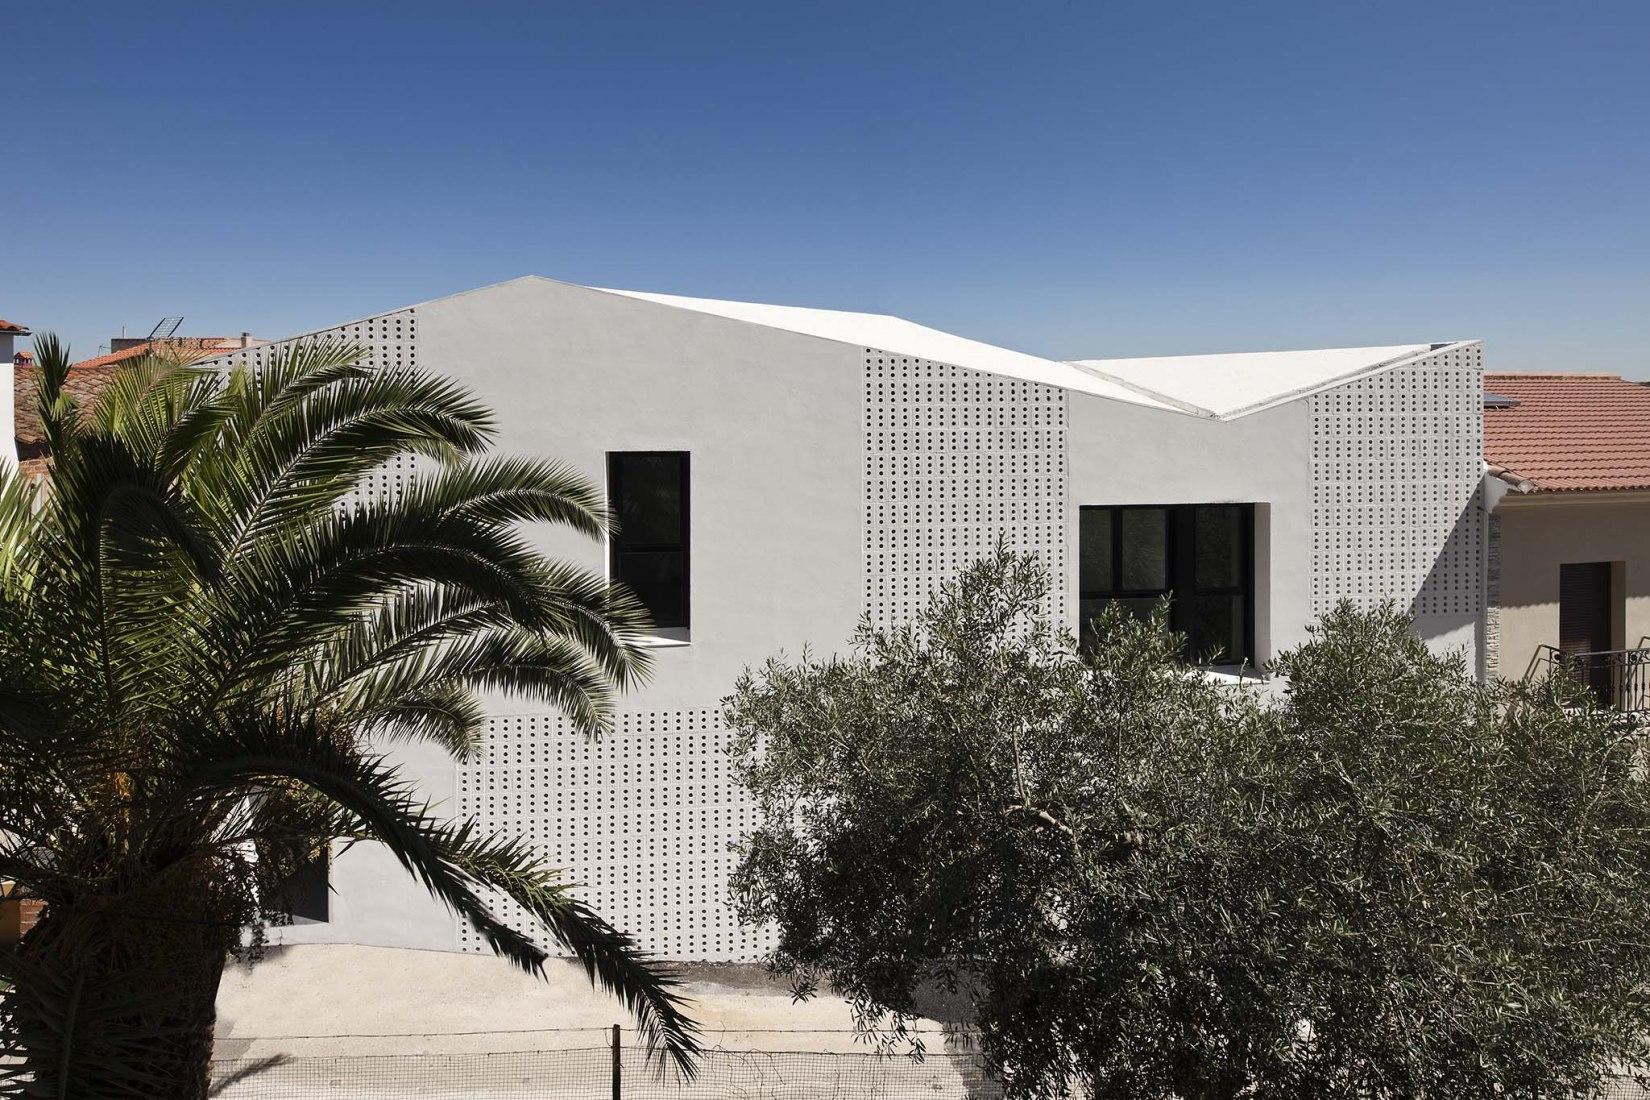 Social Housing in Badajoz by Angas Kipa. Photograph by Fernando Alda